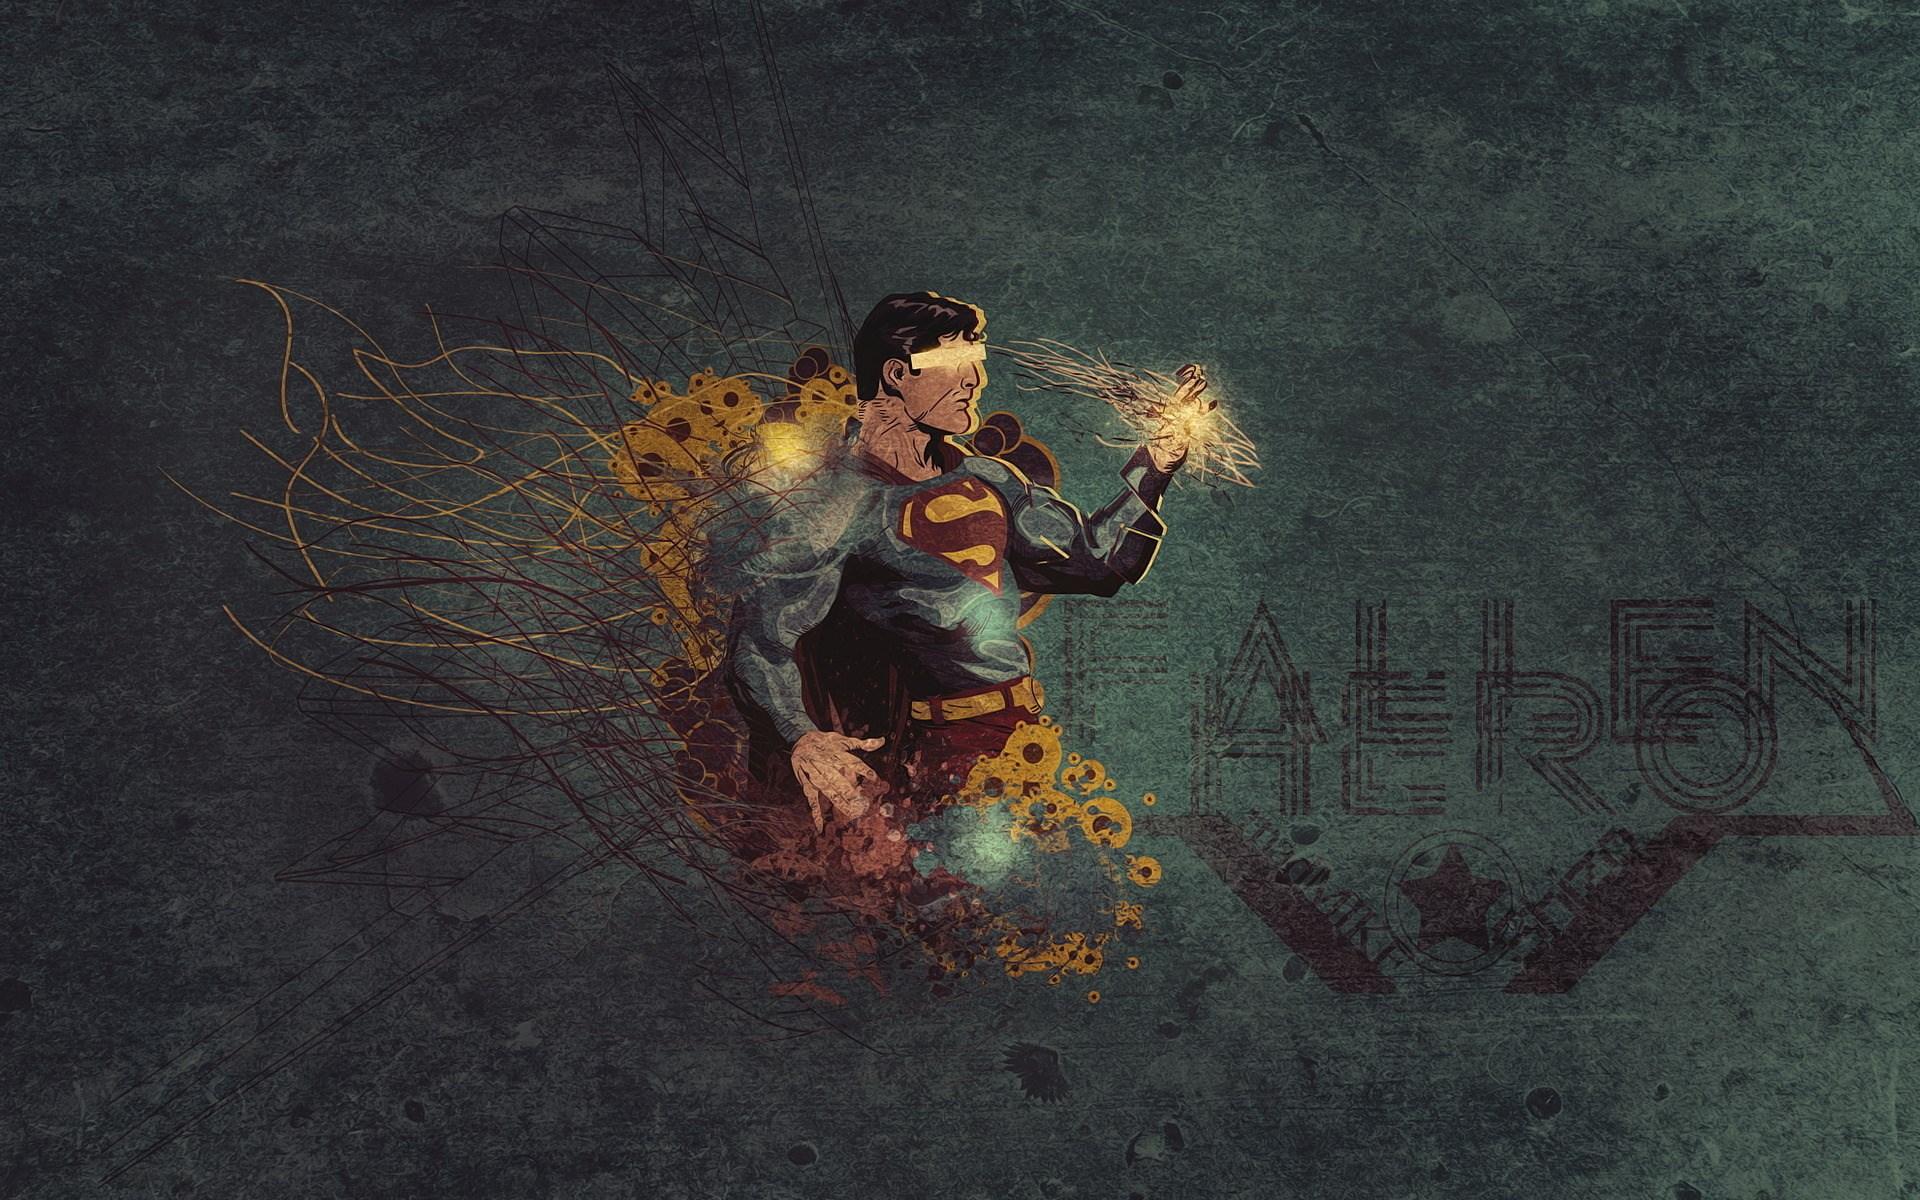 Drawn wallpaper vector Wallpapers hd vector wallpapers superman